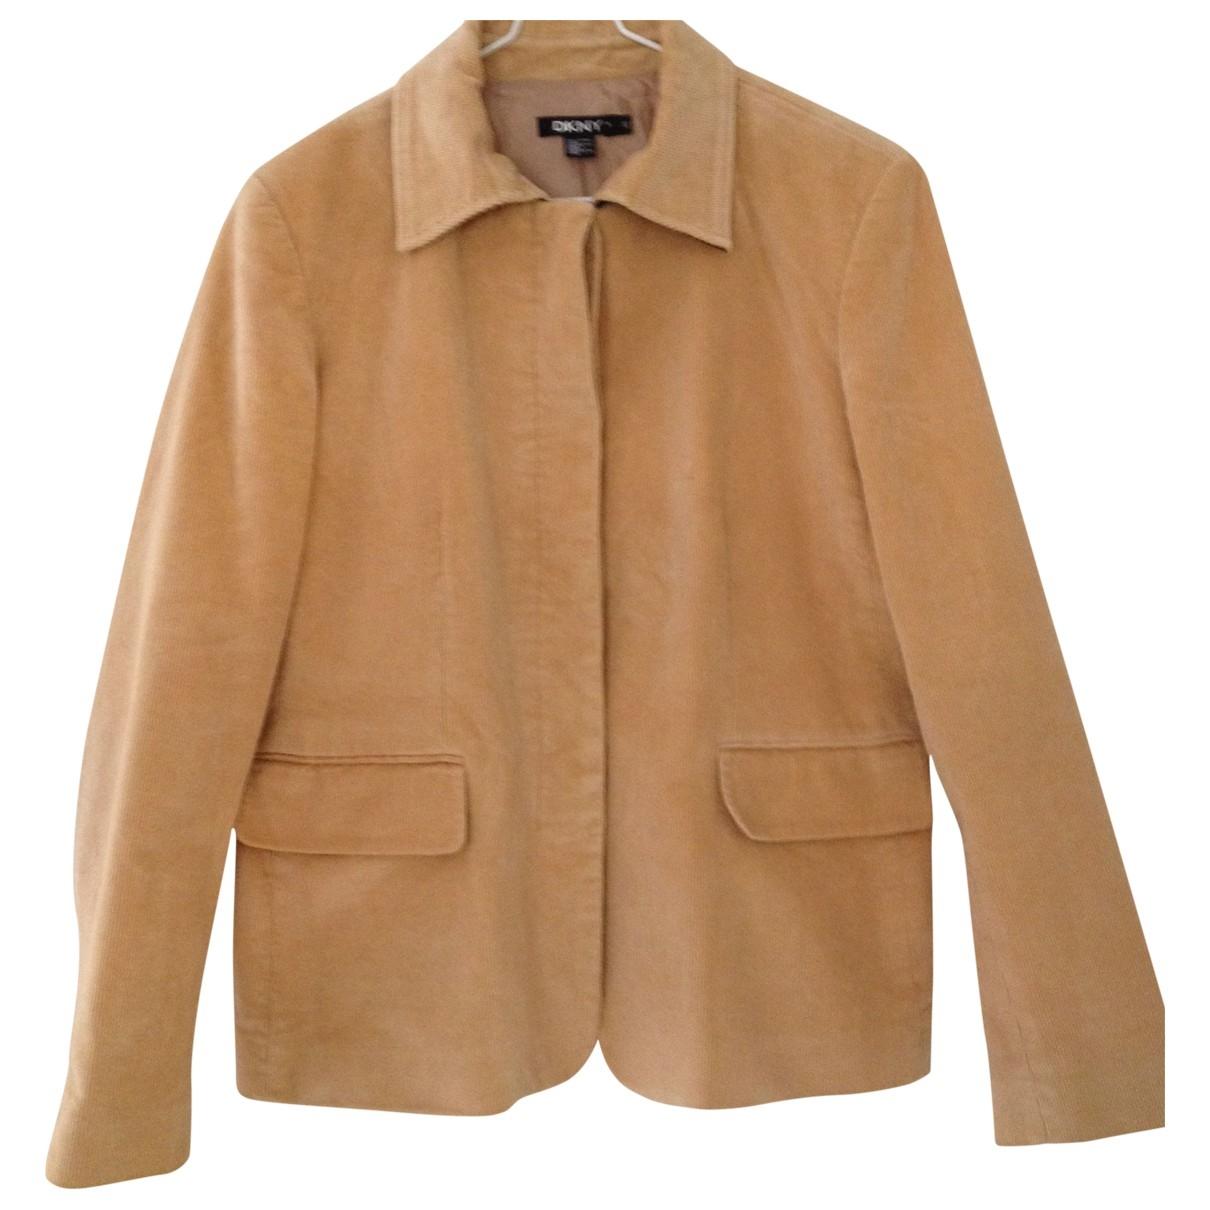 Dkny \N Camel Cotton jacket for Women 12 UK